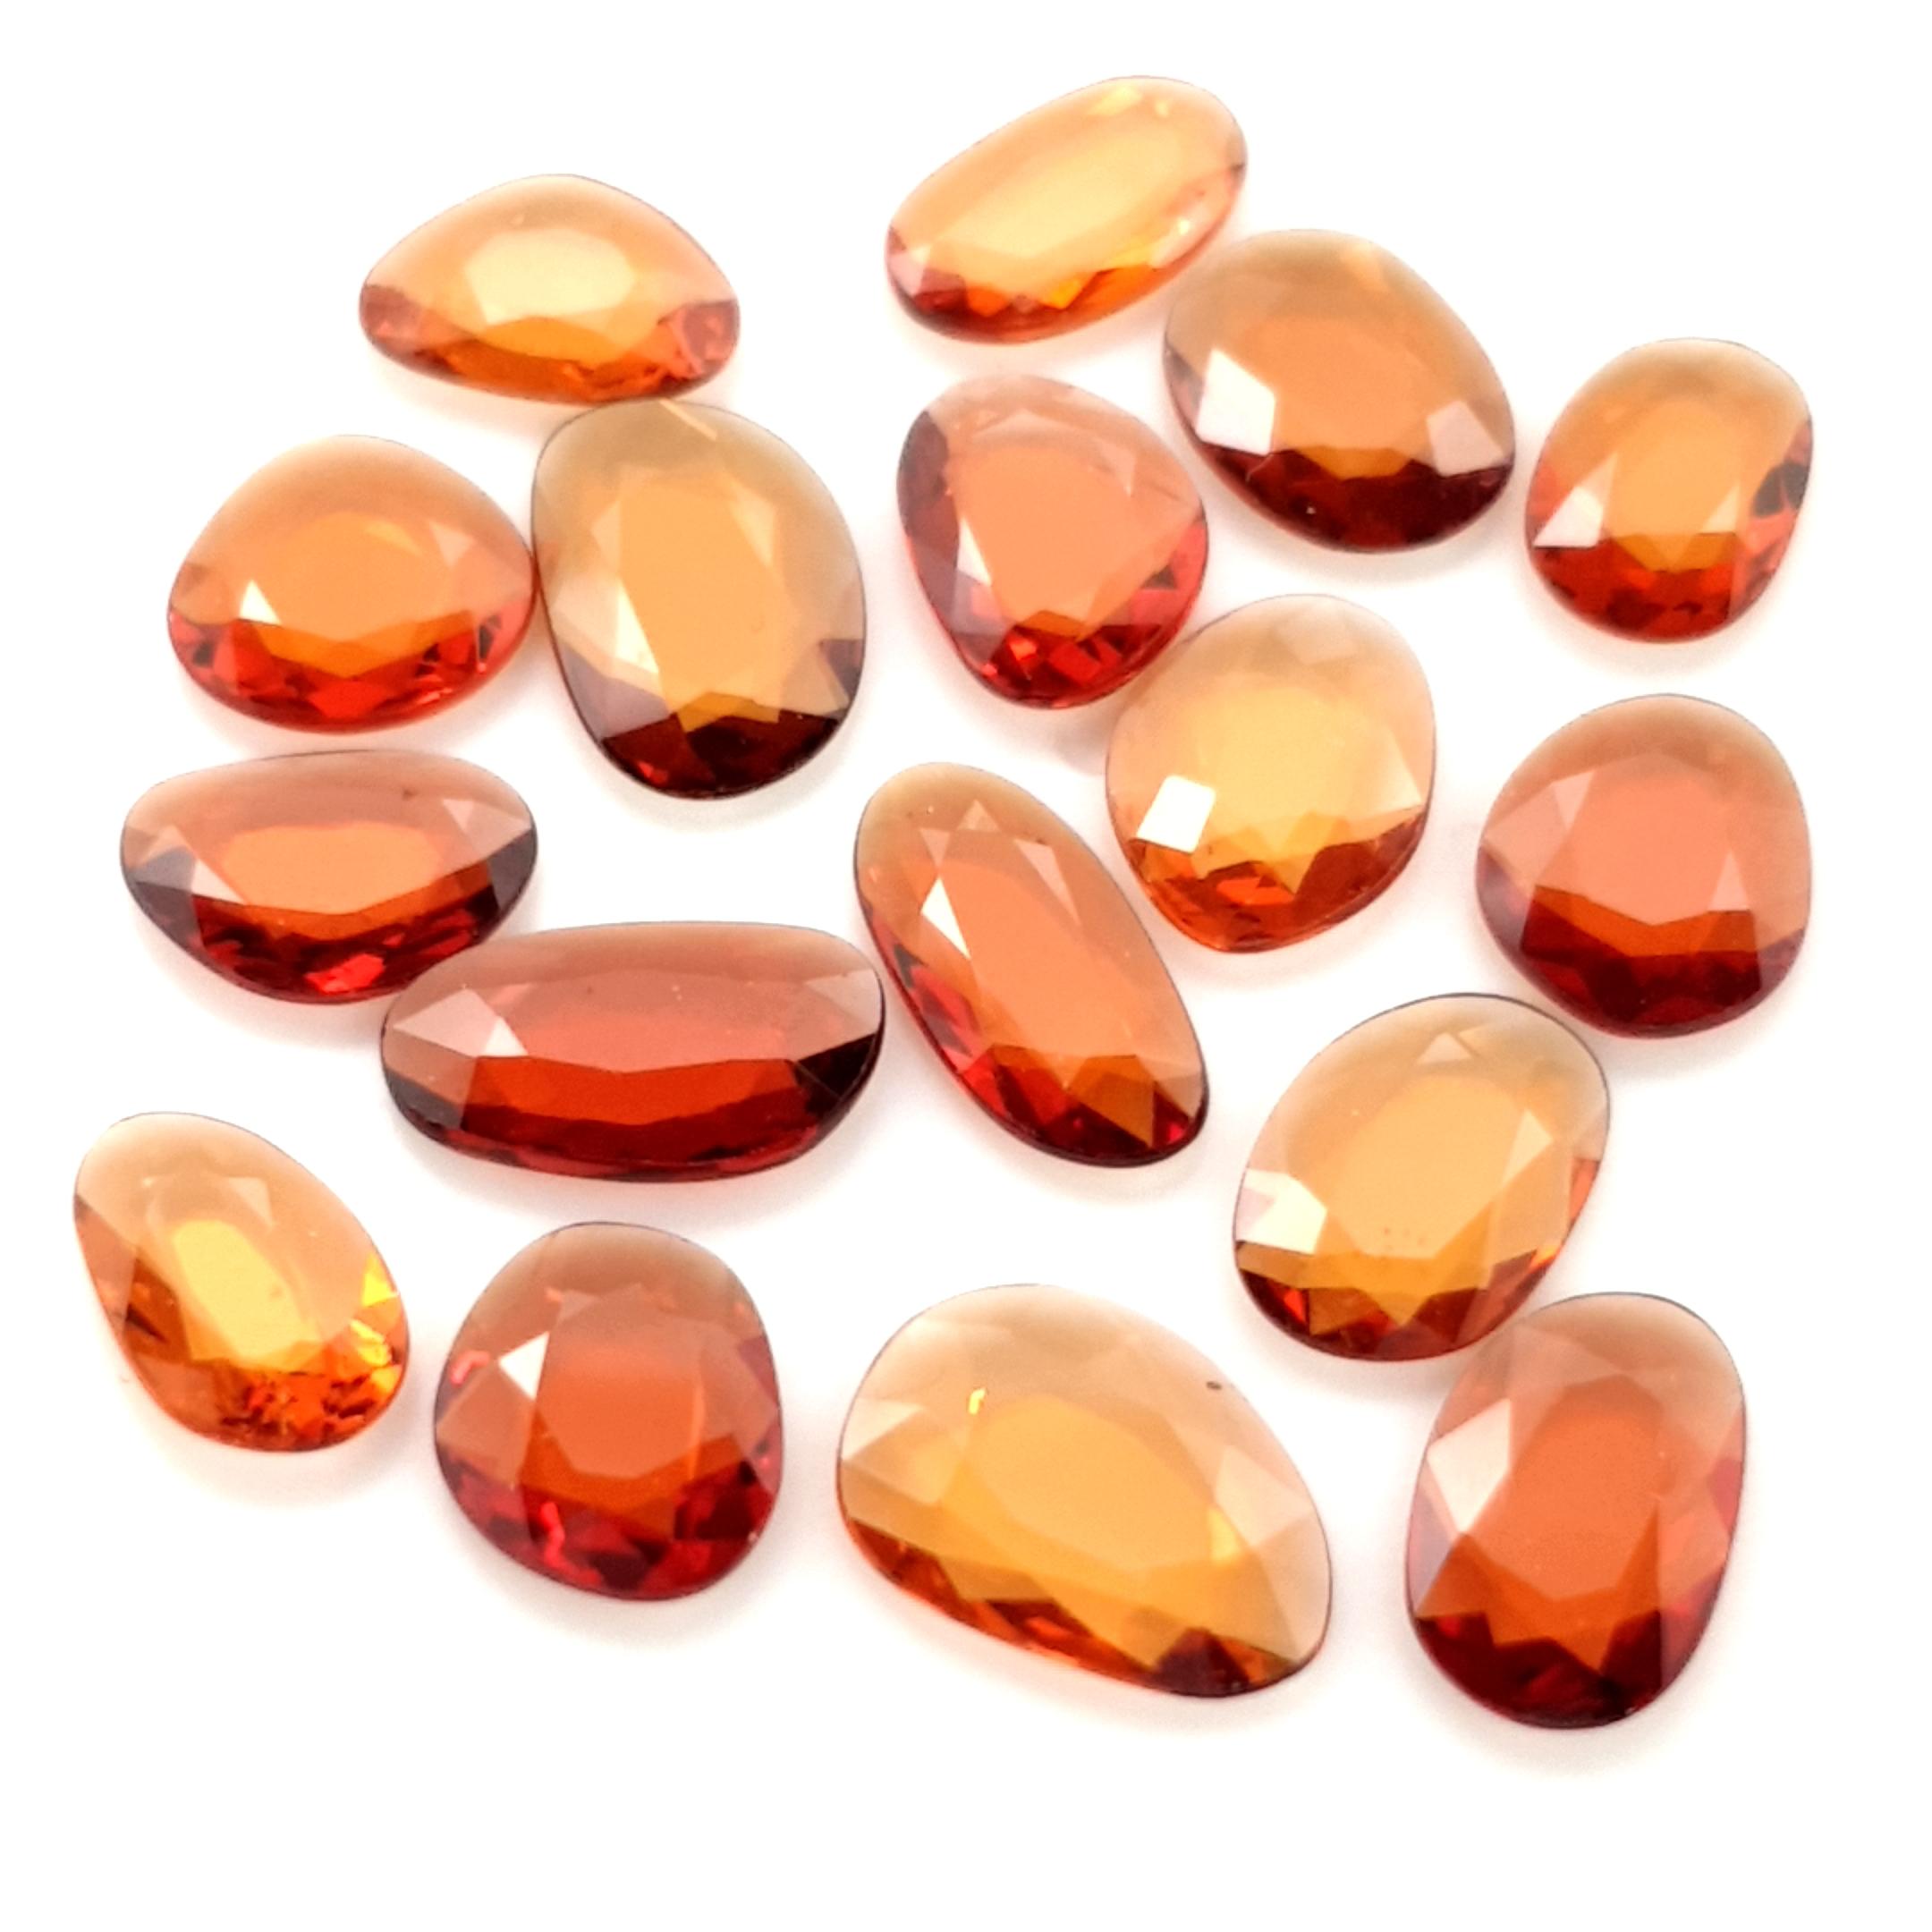 0,75-1,50ct.size Spessartite Garnet DoubleRoseCut GSK17C8 ClaudiaHamann__2021-02-28-21-29-07